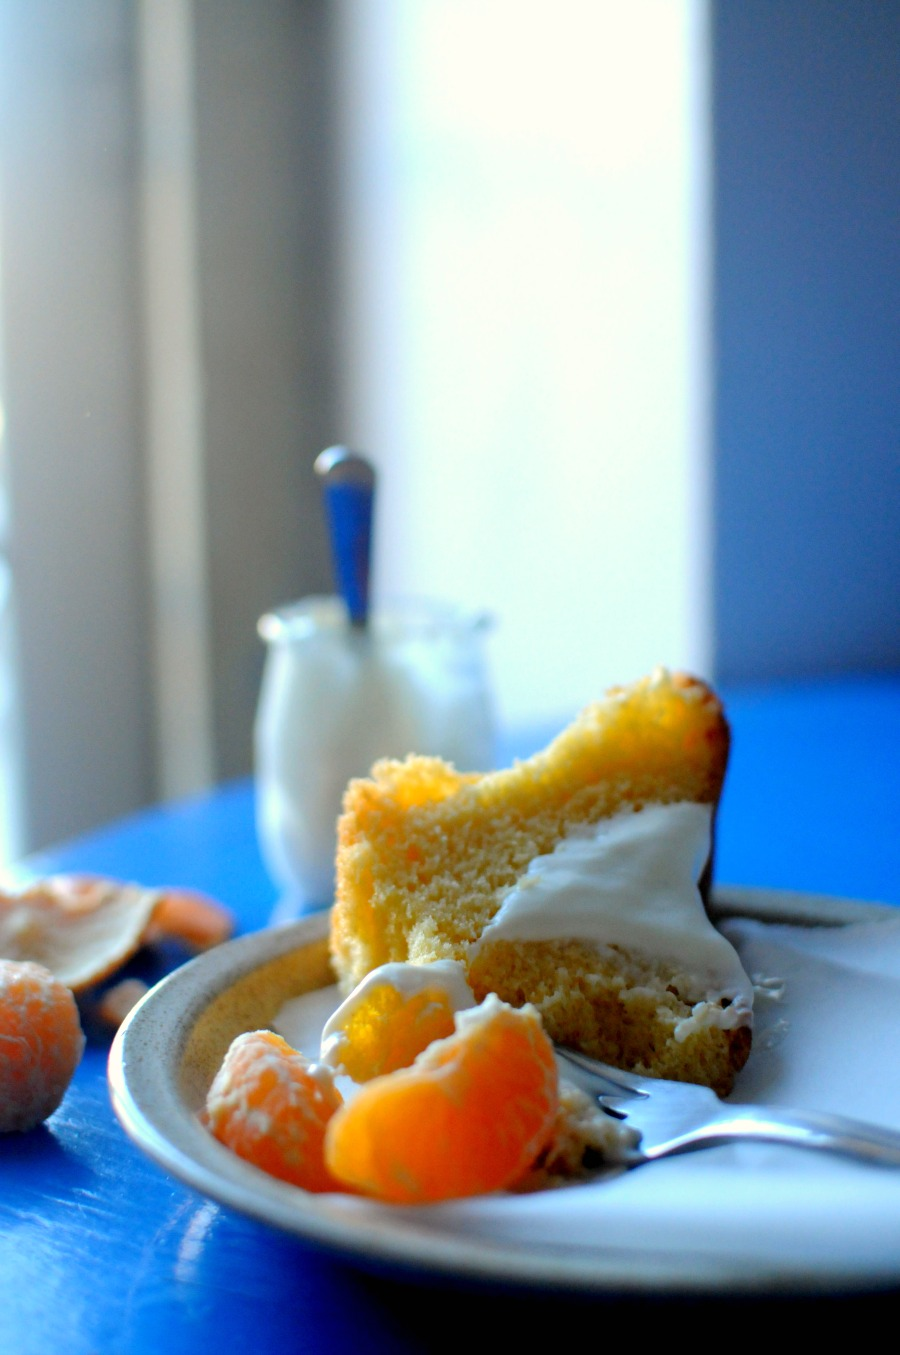 pao de lo with oranges and cream